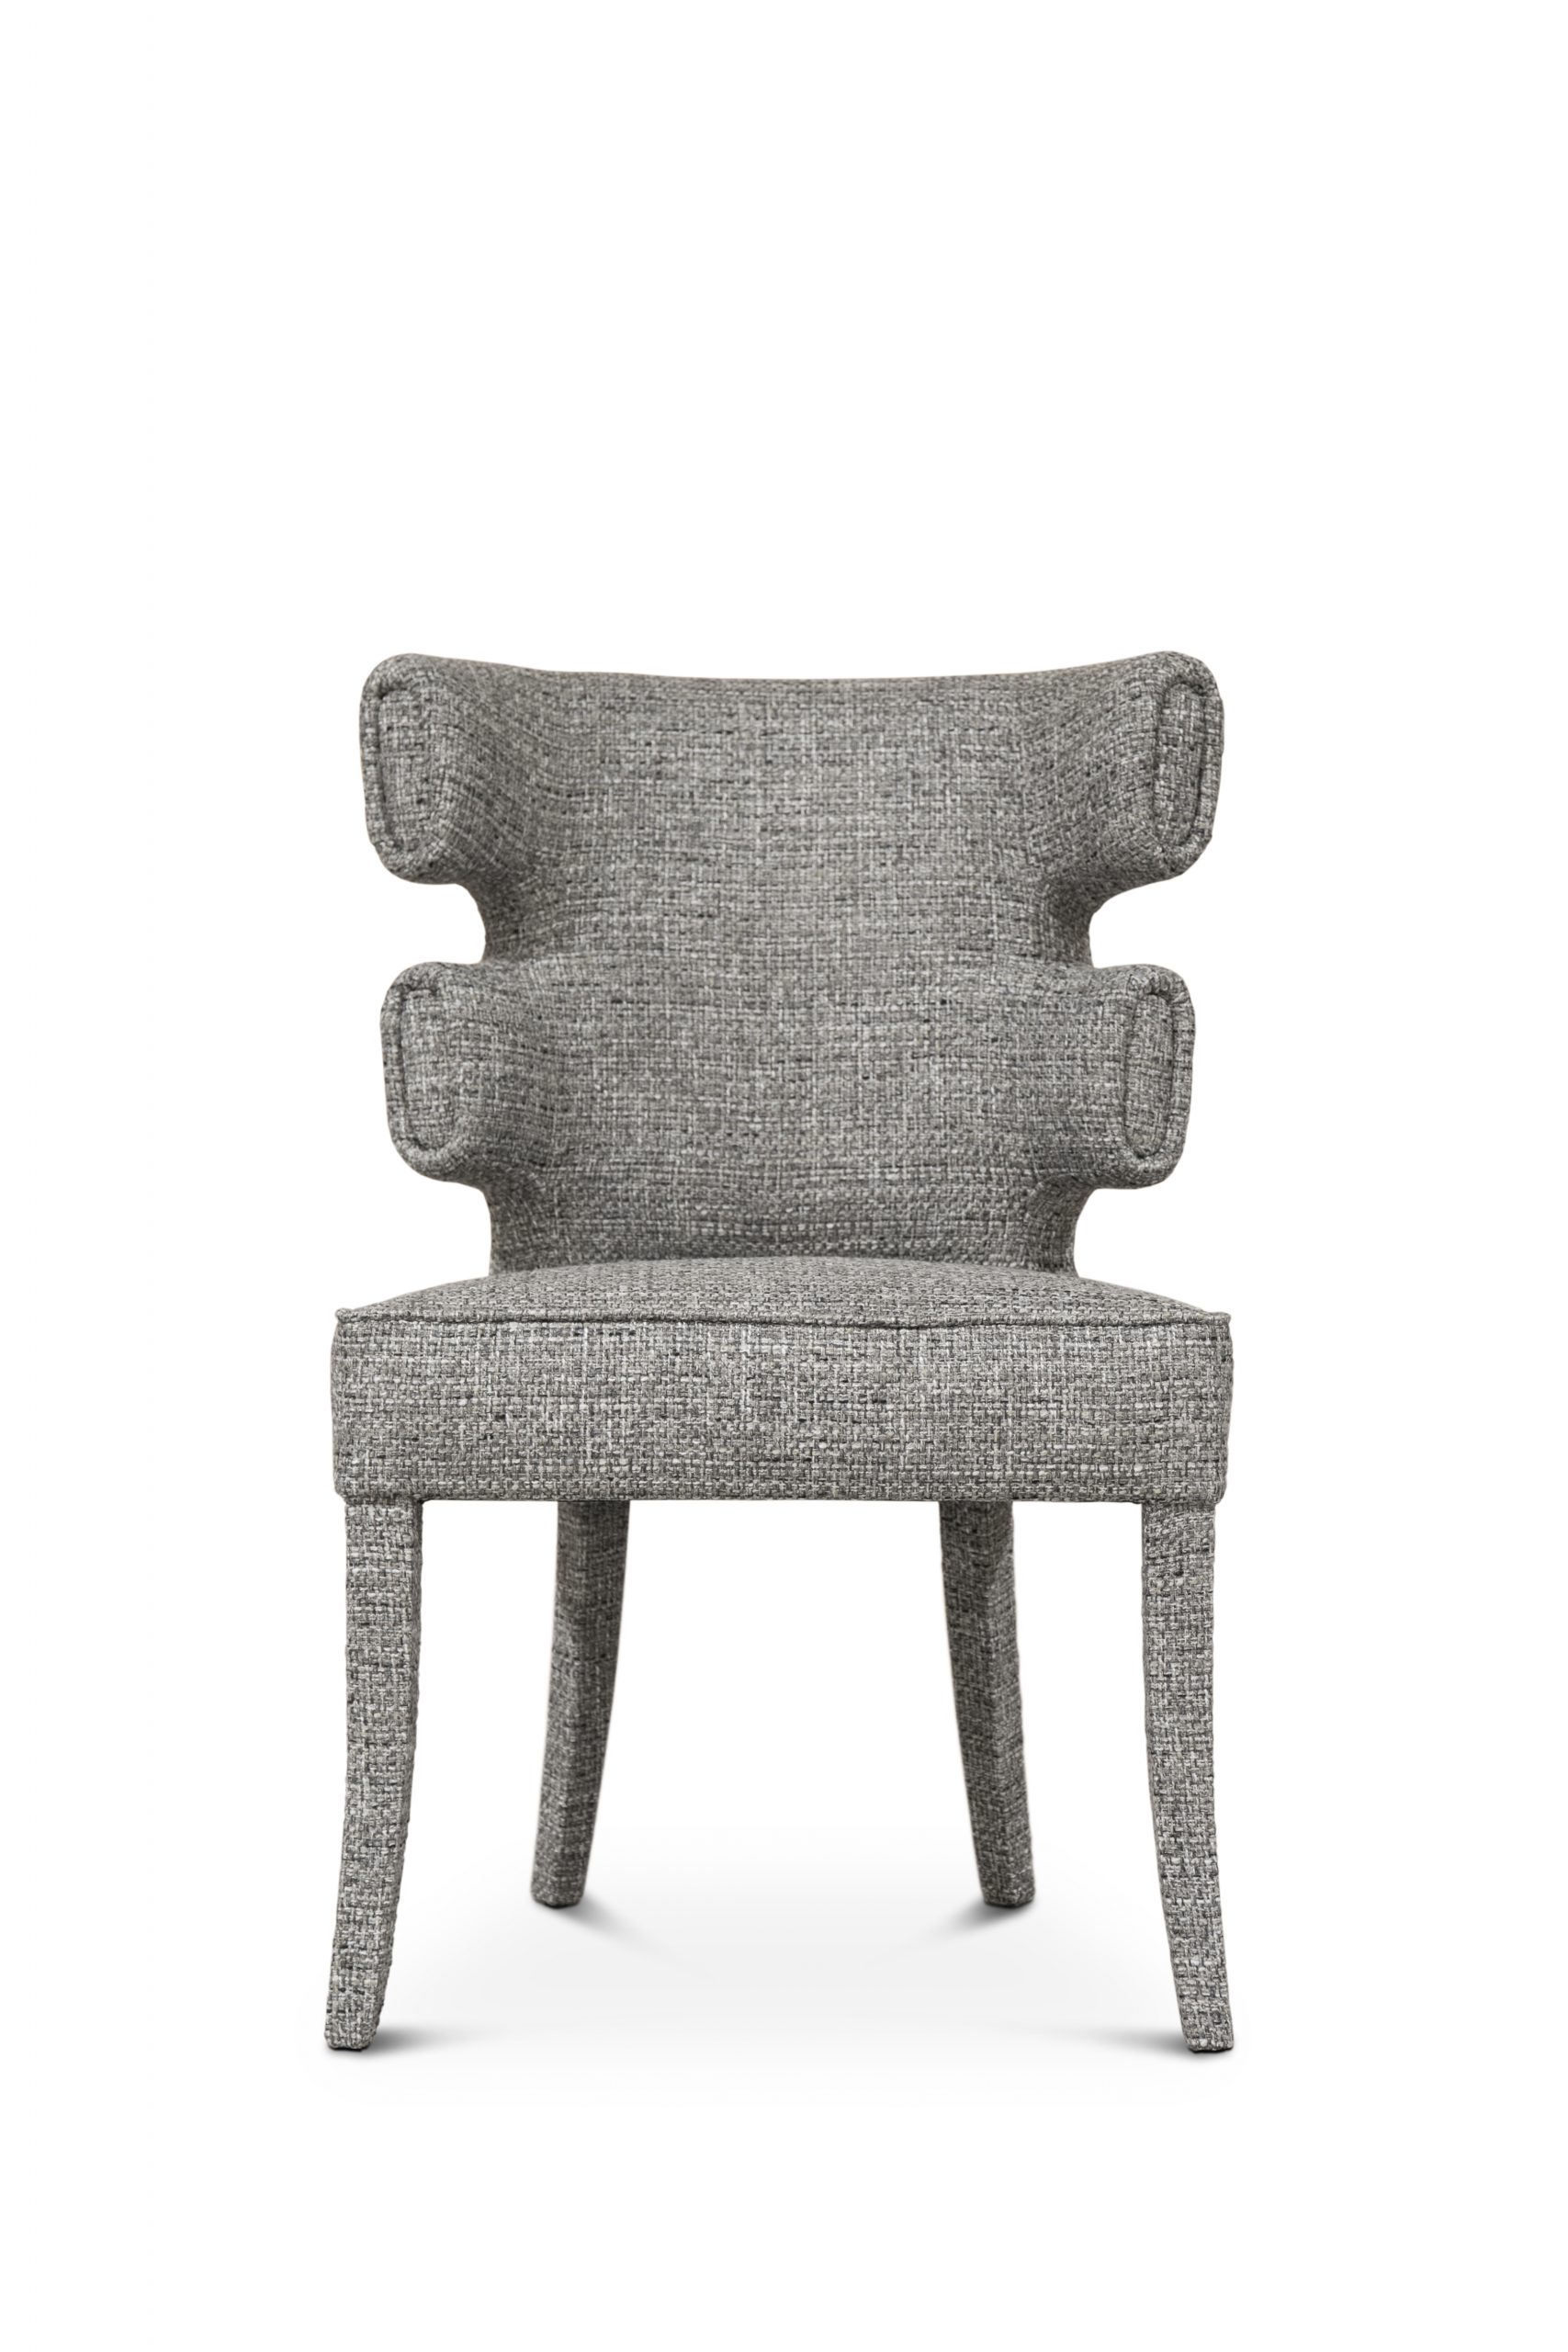 STOLA Dining Chair; Dining Chair; Upholstery; Modern; Sophistication; Elegance; Classiness; Comfort; Fierceness; BRABBU; Design; Furniture stola dining chairSTOLA Dining Chair: A Symbol of Elegance and Sophisticationgaia dining chair 2 scaled